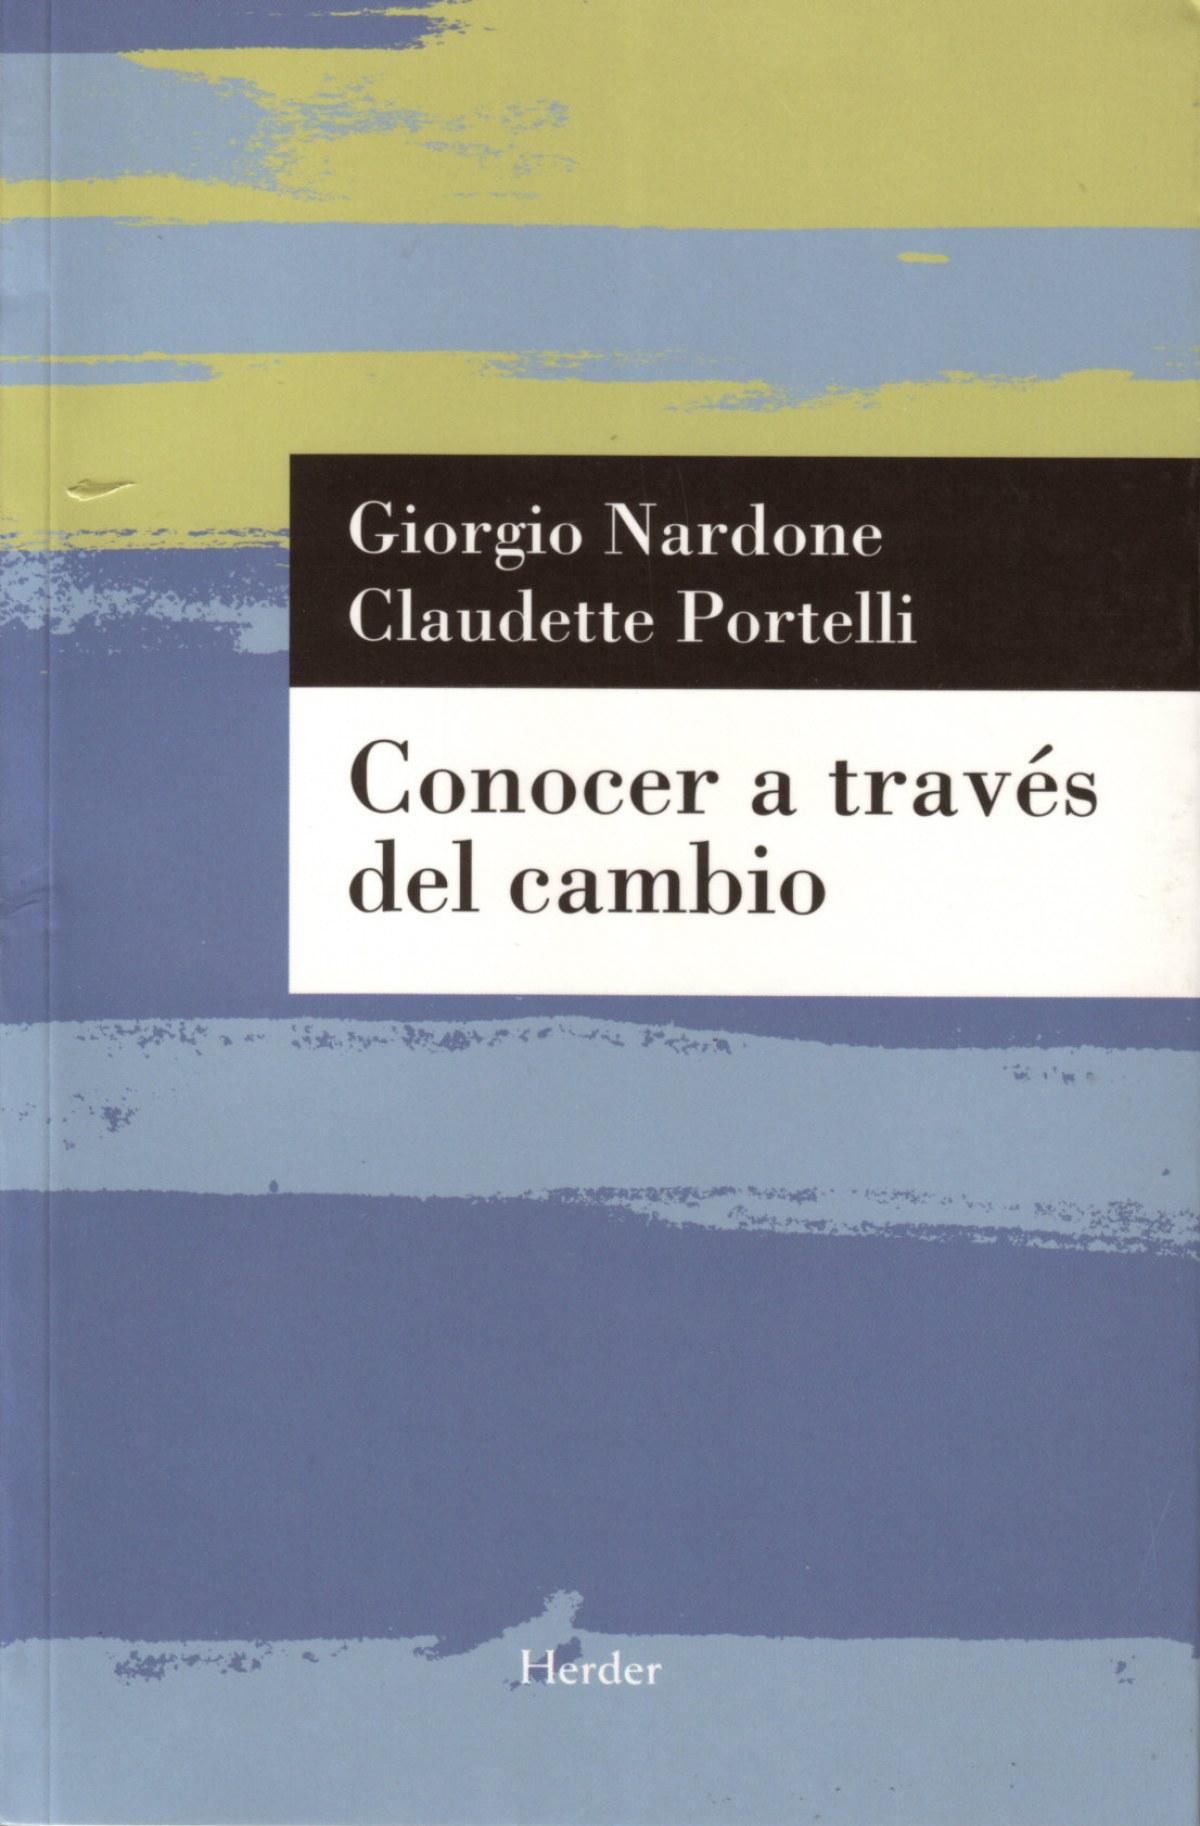 Conocer a través del cambio La evolución de la terapia breve estratégica - Nardone, Giorgio/Portelli, Claudette